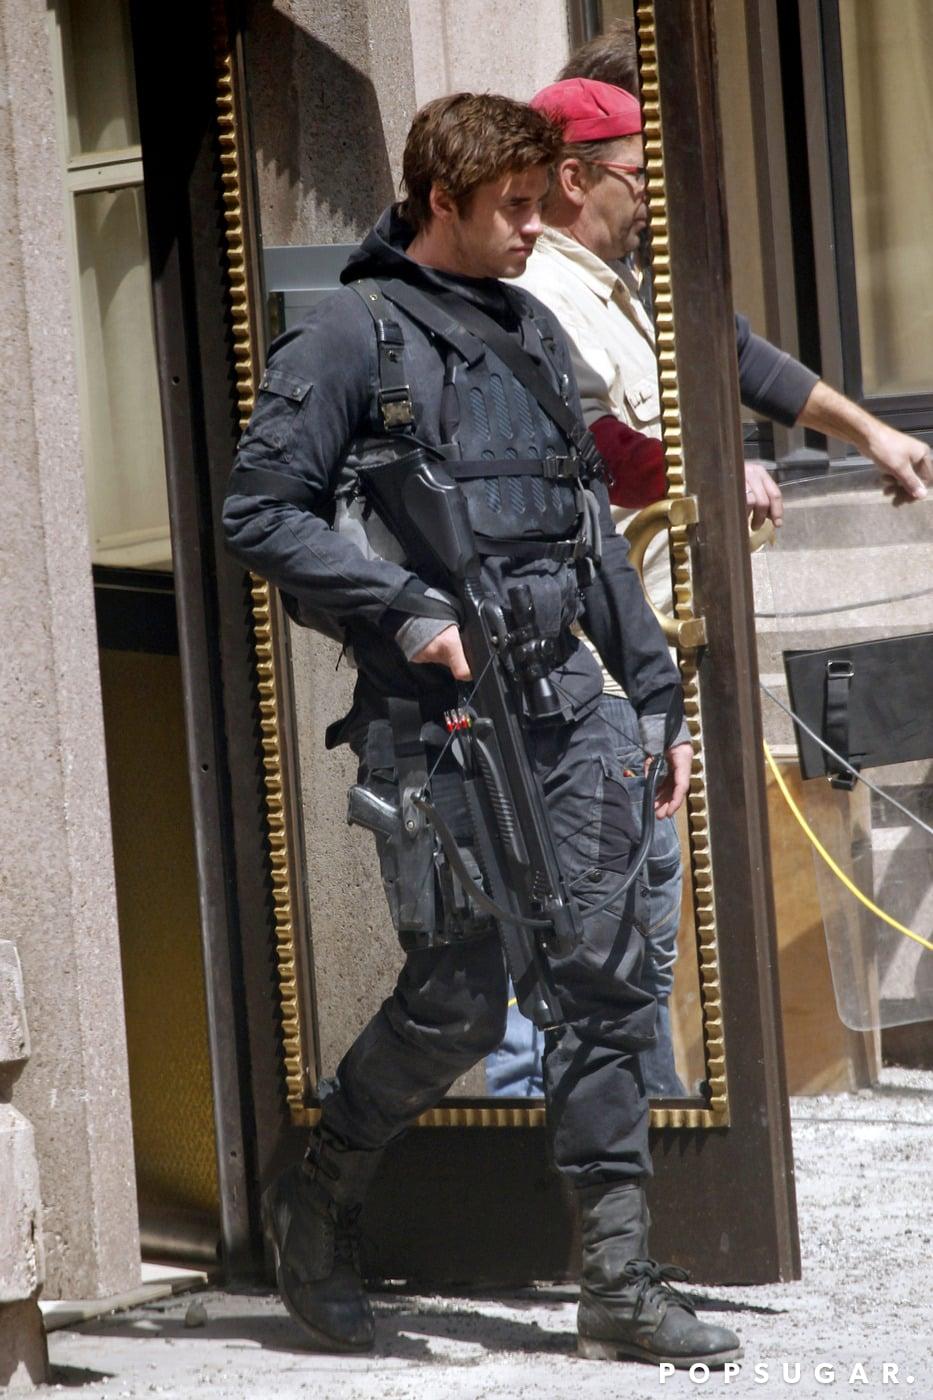 Hemsworth jumped into Gale's combat uniform.